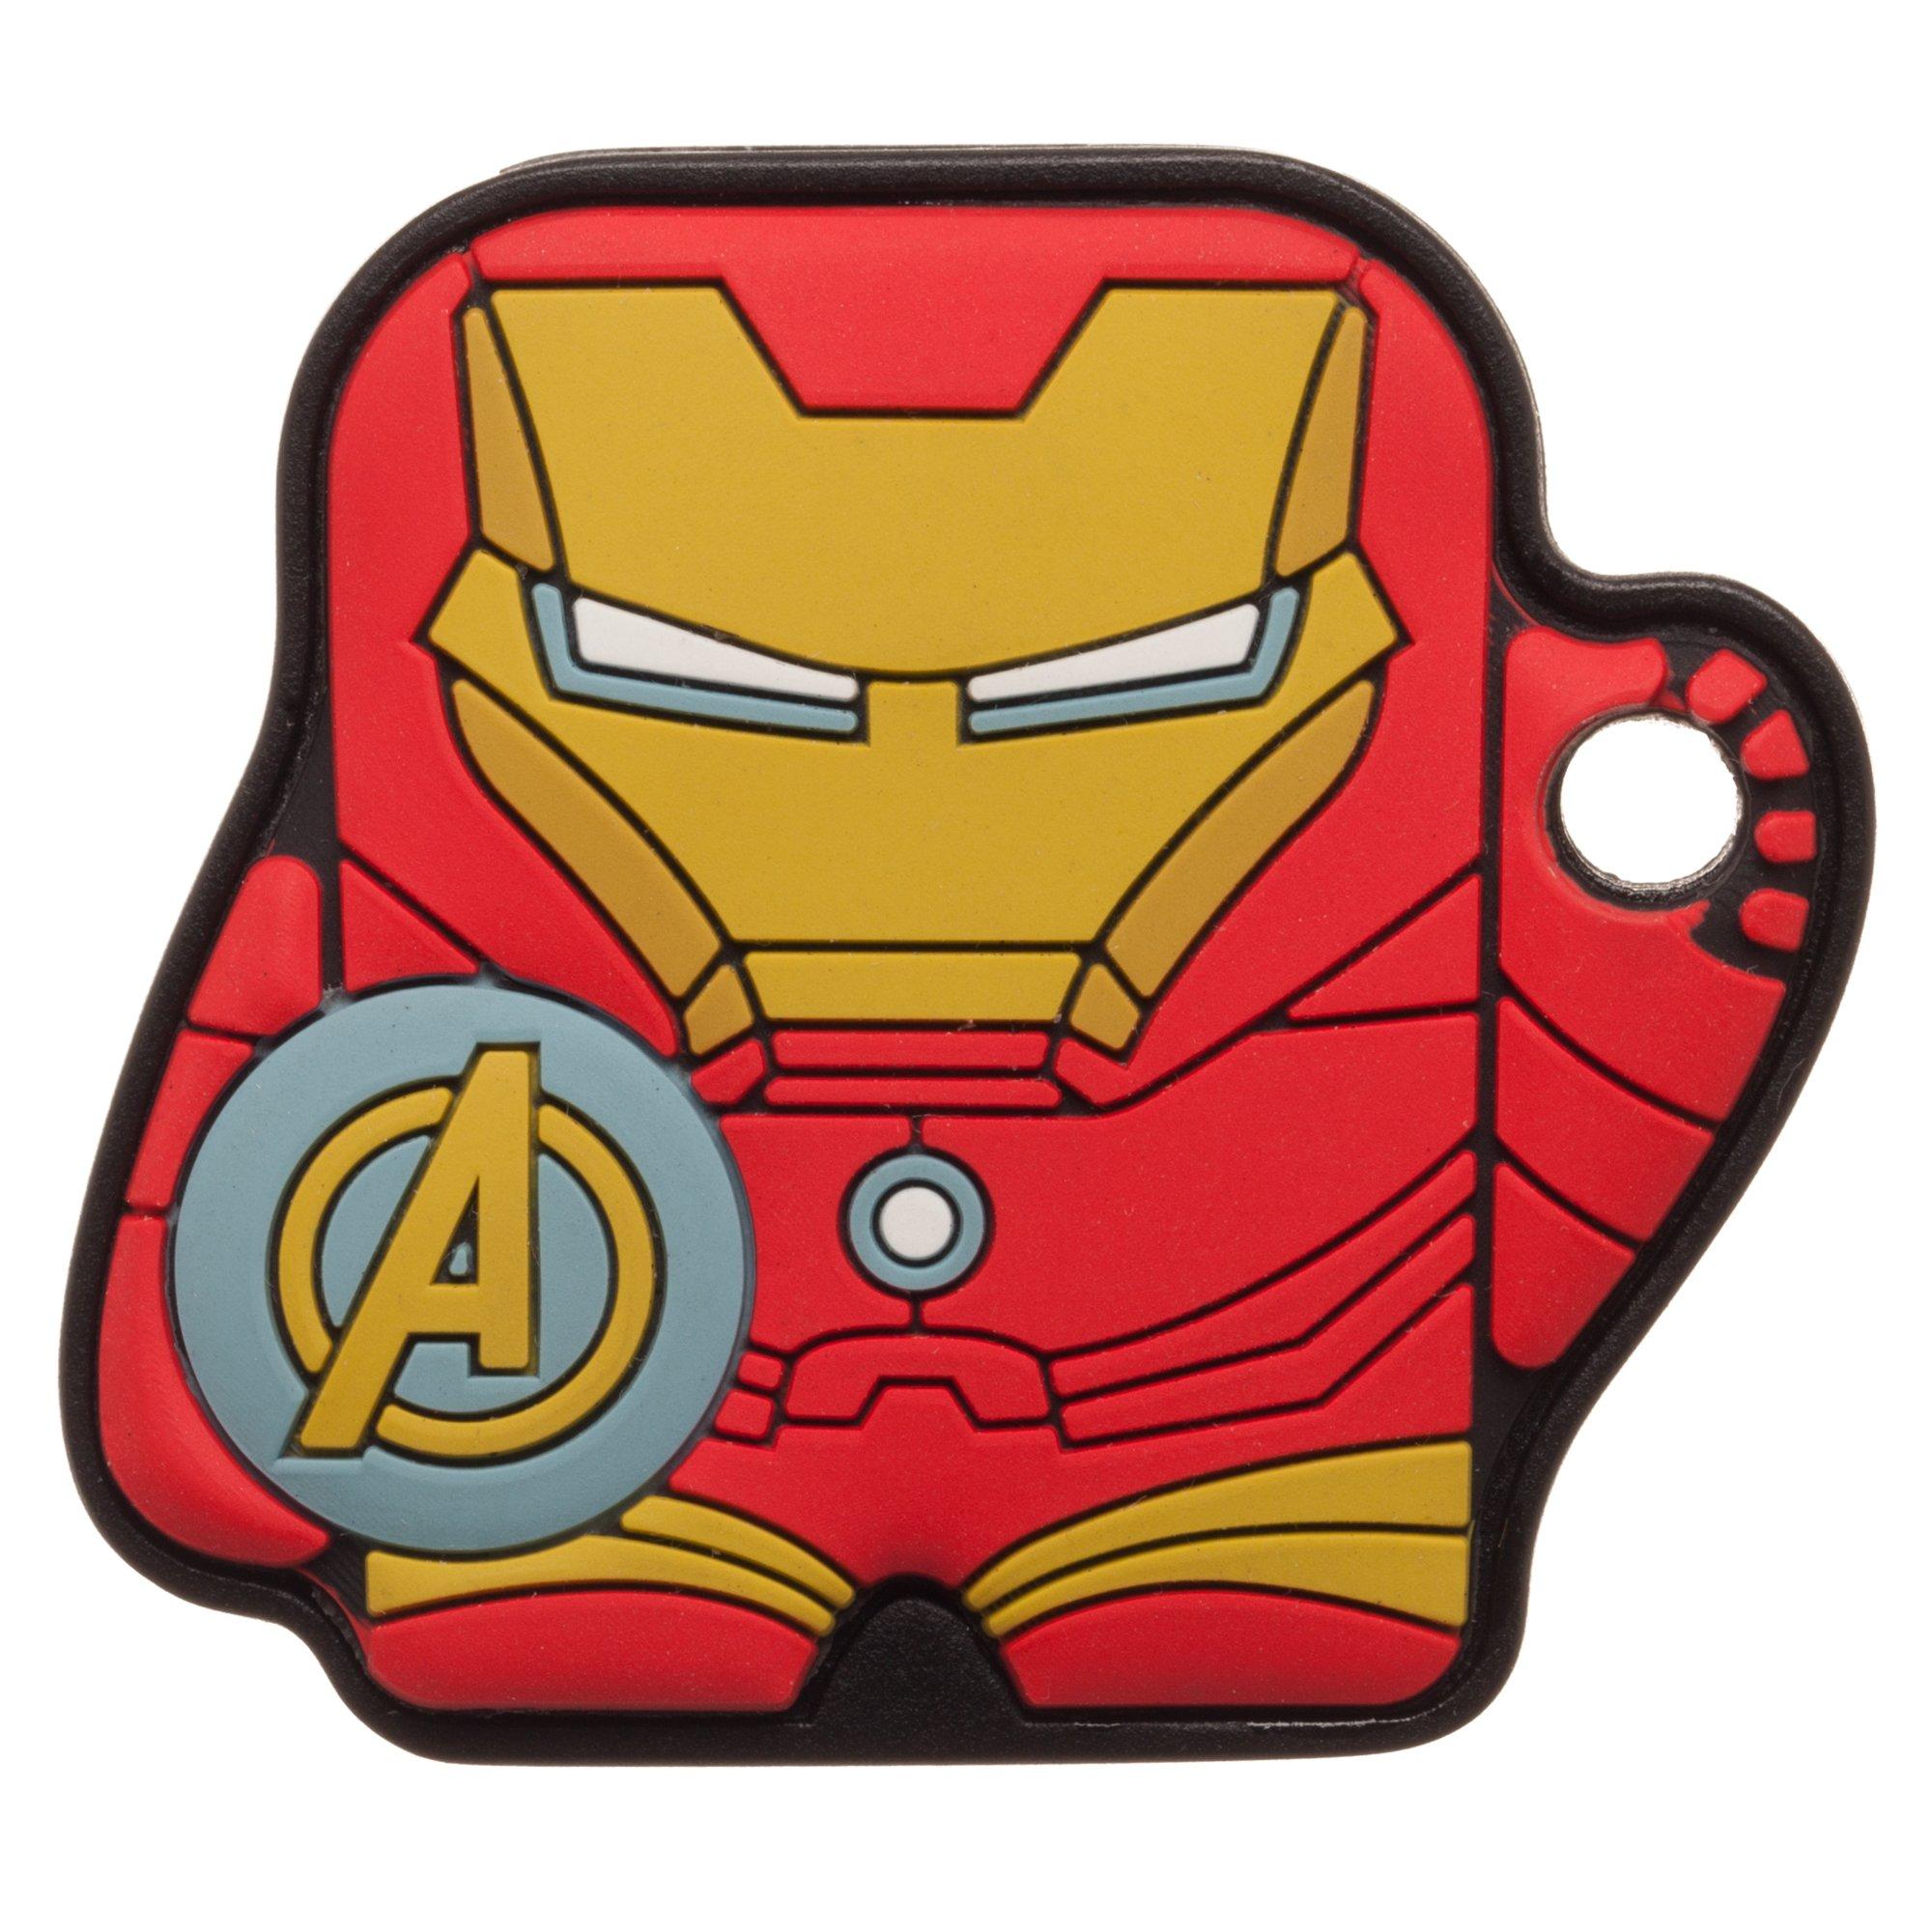 Marvel foundmi 2.0 Personal Bluetooth Tracker, Iron Man